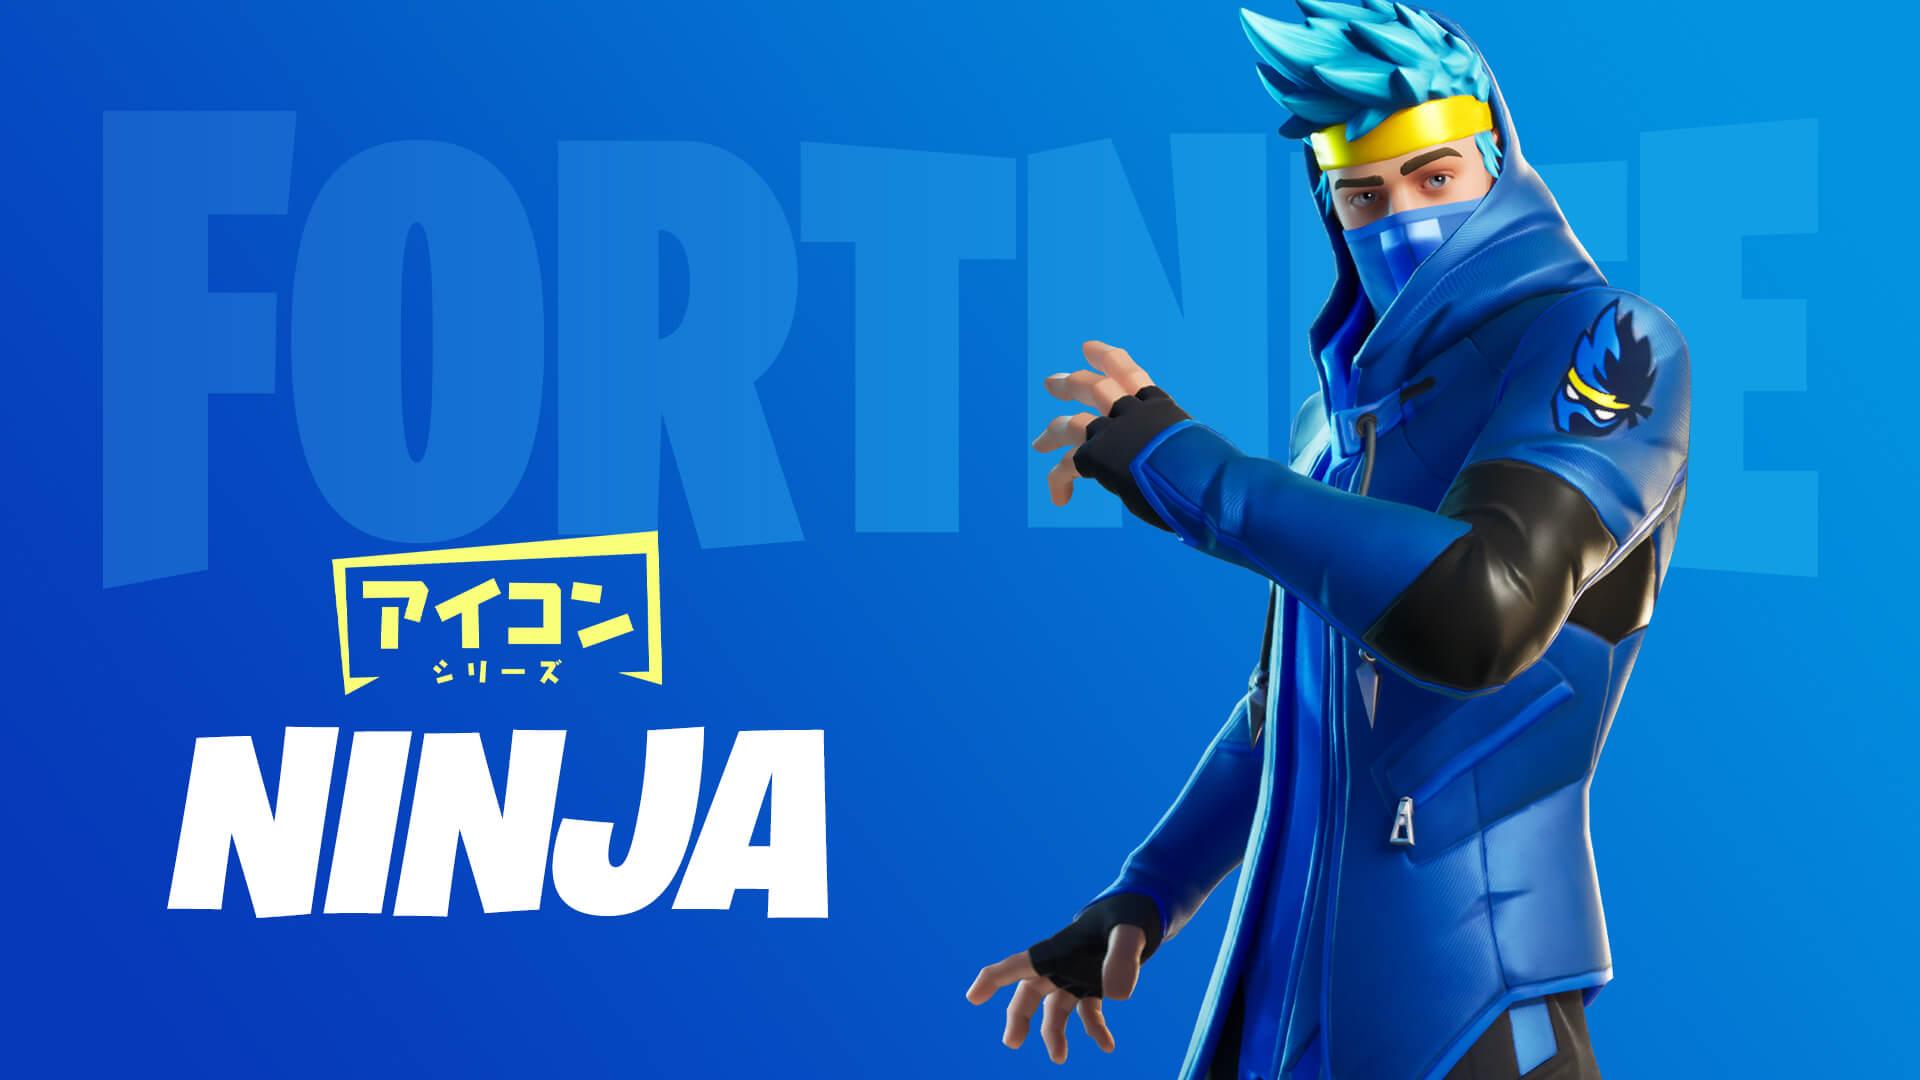 JP_Ninja.jpg